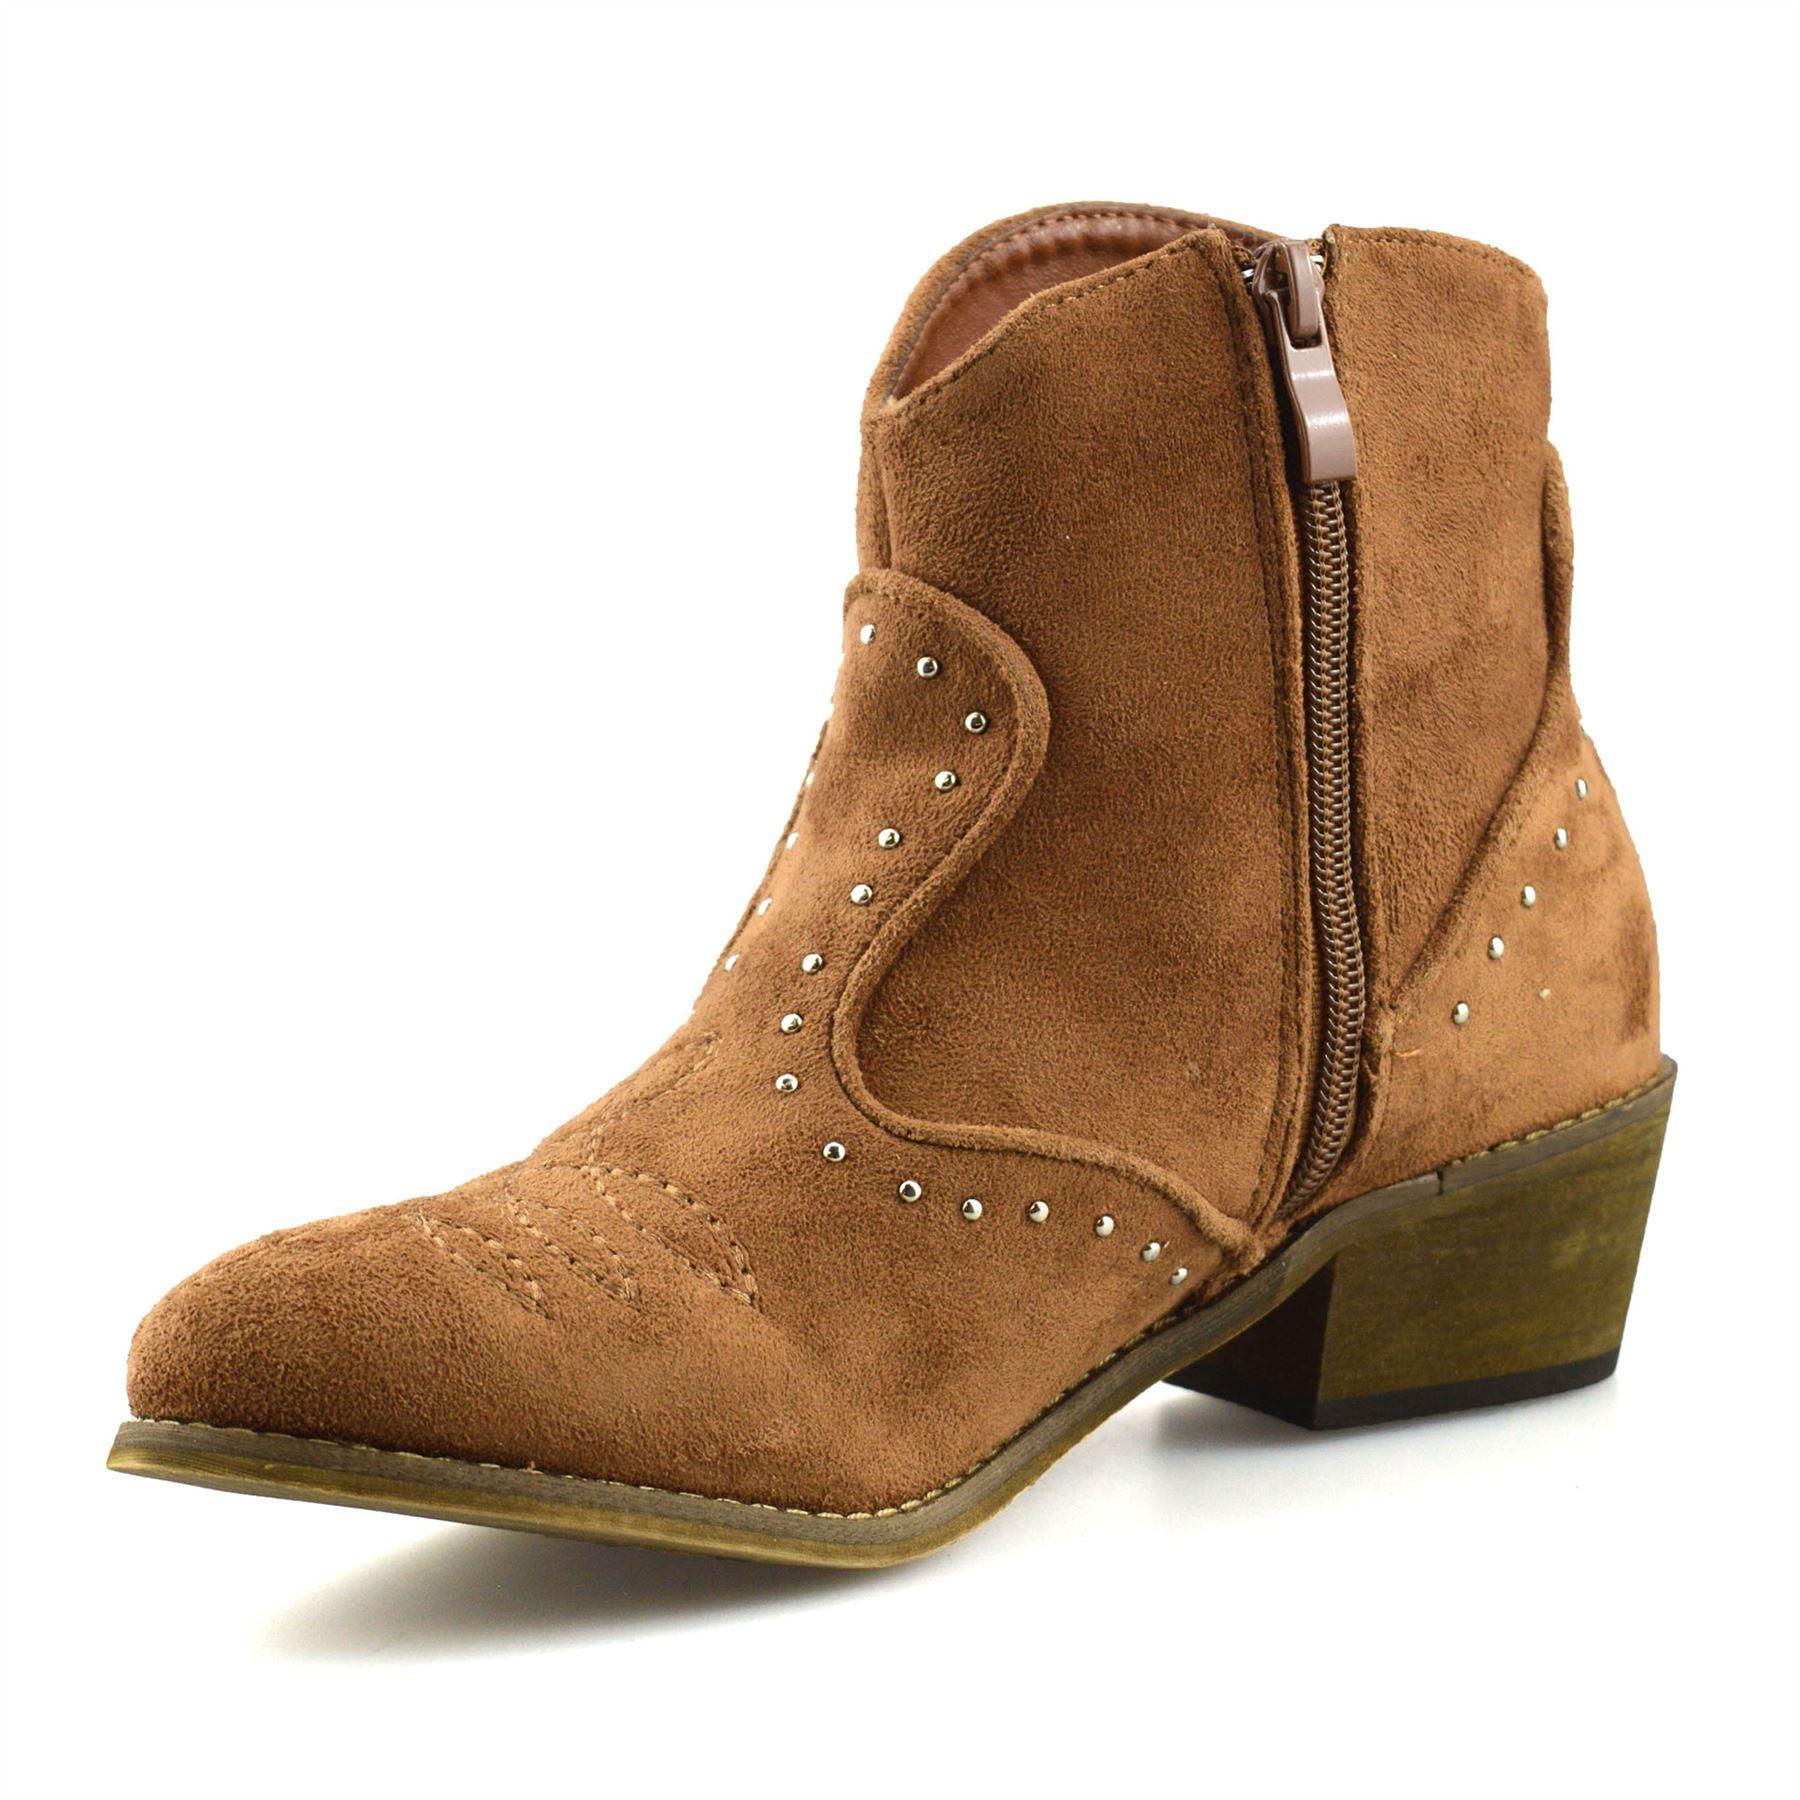 Ladies-Womens-Suede-Mid-Block-Heel-Zip-Up-Ankle-Cowboy-Biker-Boots-Shoes-Size thumbnail 19